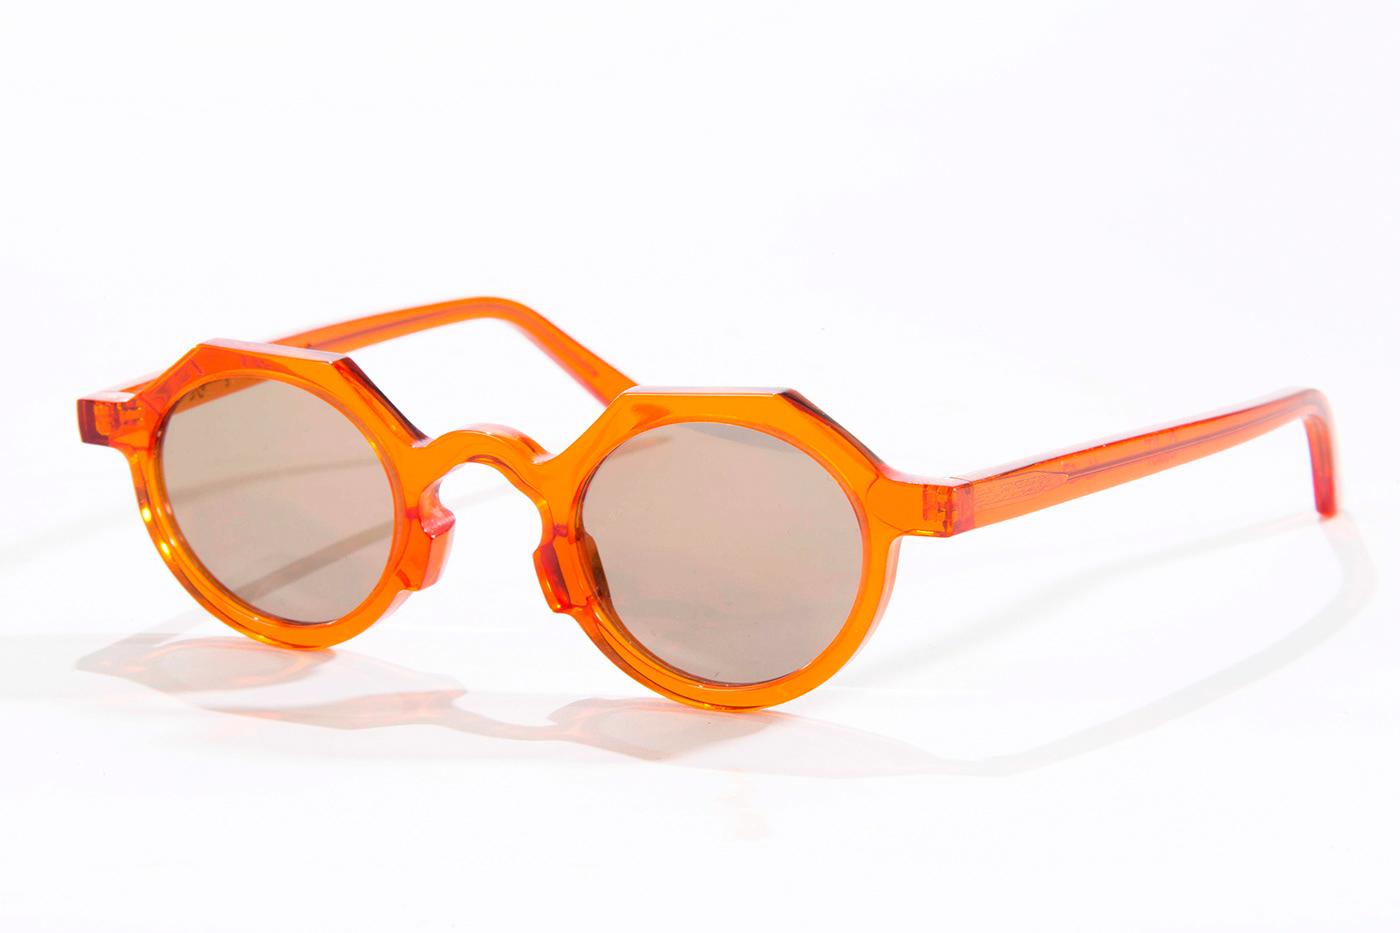 eye wear glasses cnc hand made Handworking made in nyc Rhino